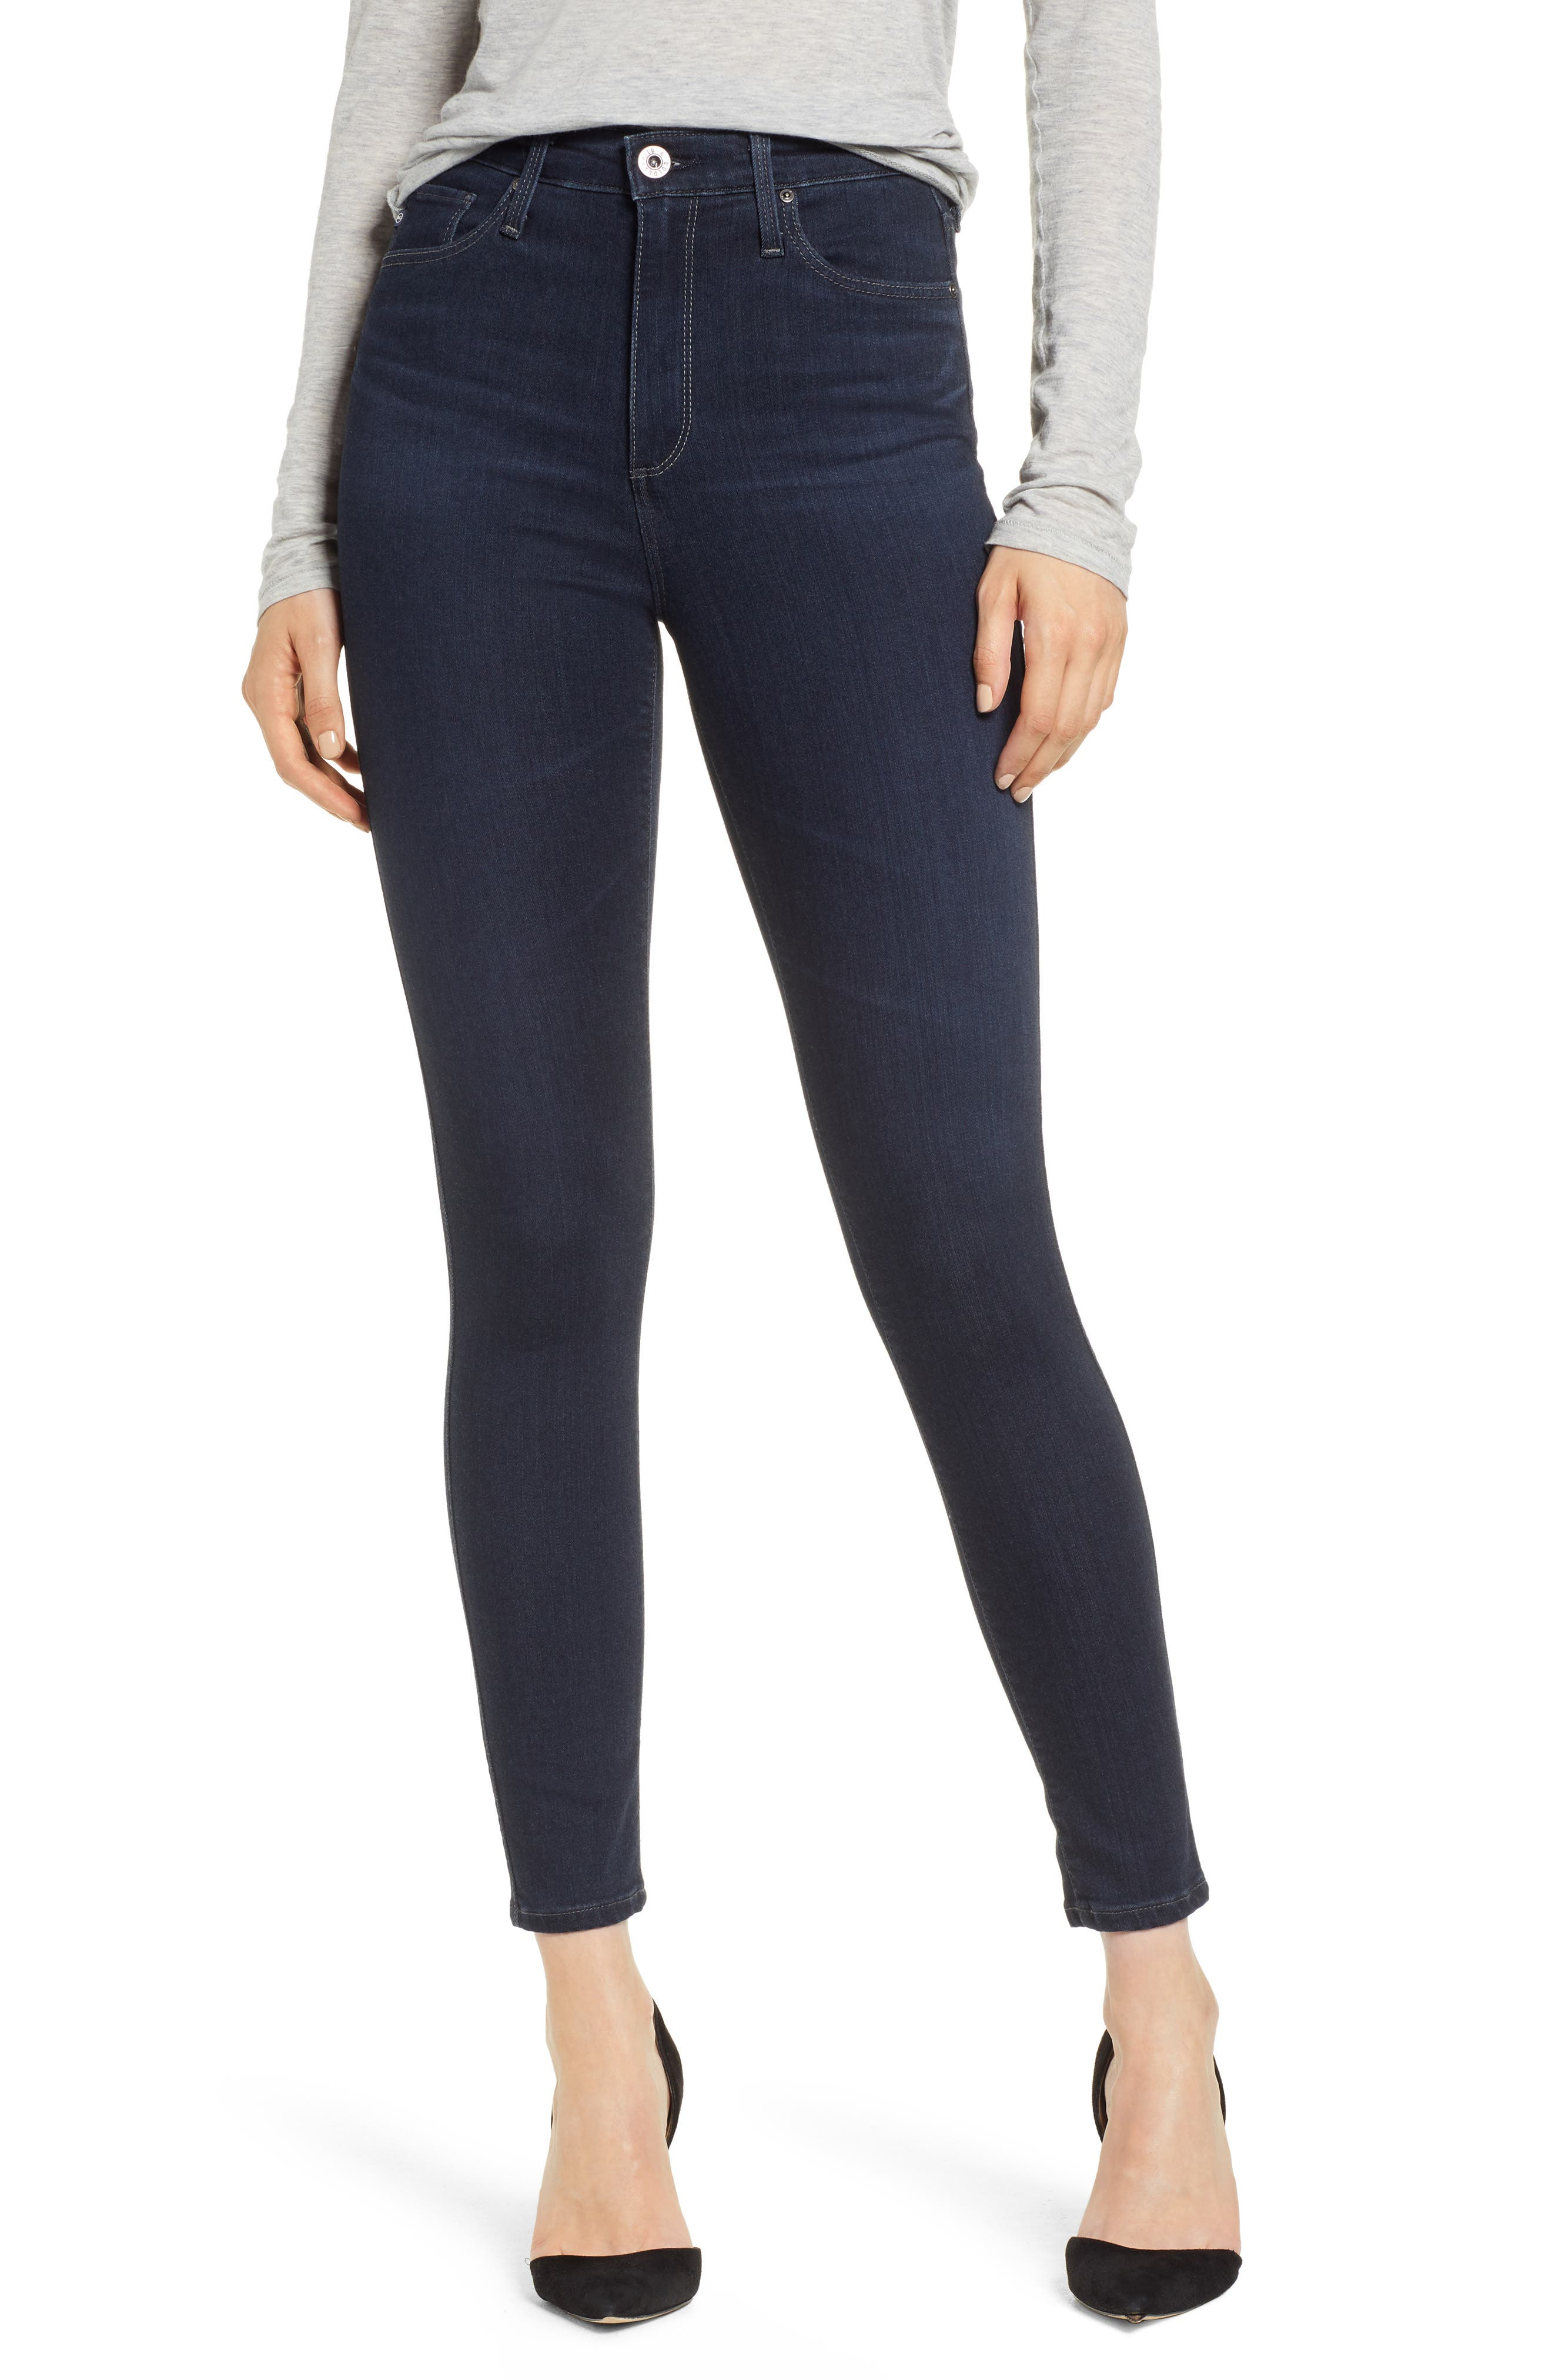 AG, The Mila Super High Waist Ankle Skinny Jeans, Main thumbnail 1, color, AUDACIOUS